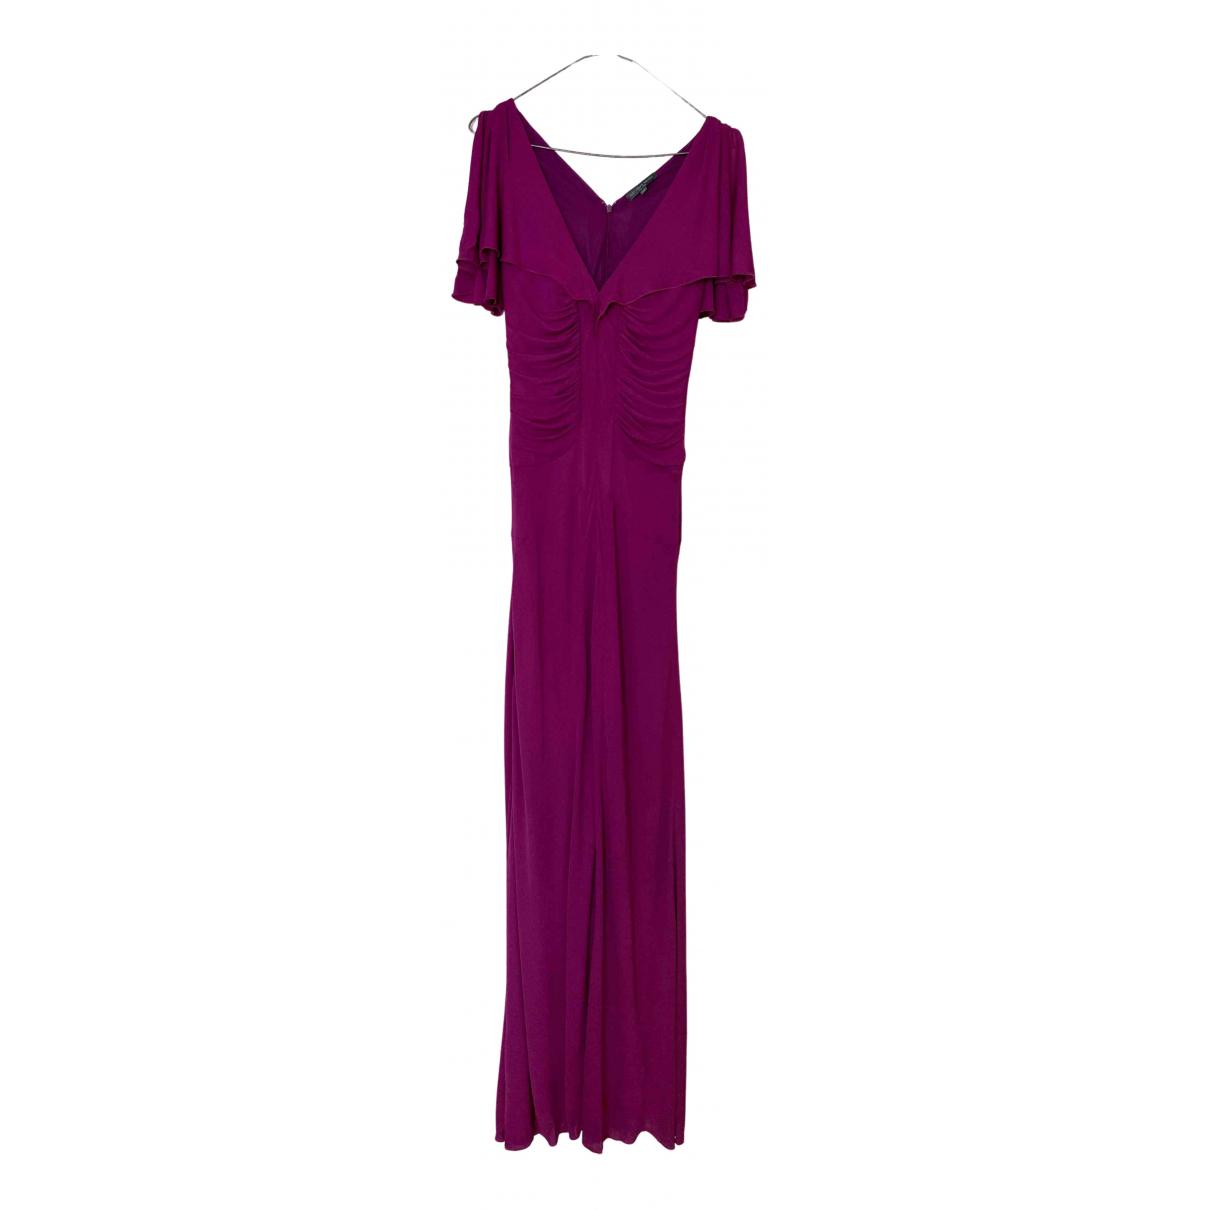 Alexander Mcqueen N Purple Cotton - elasthane dress for Women 38 IT